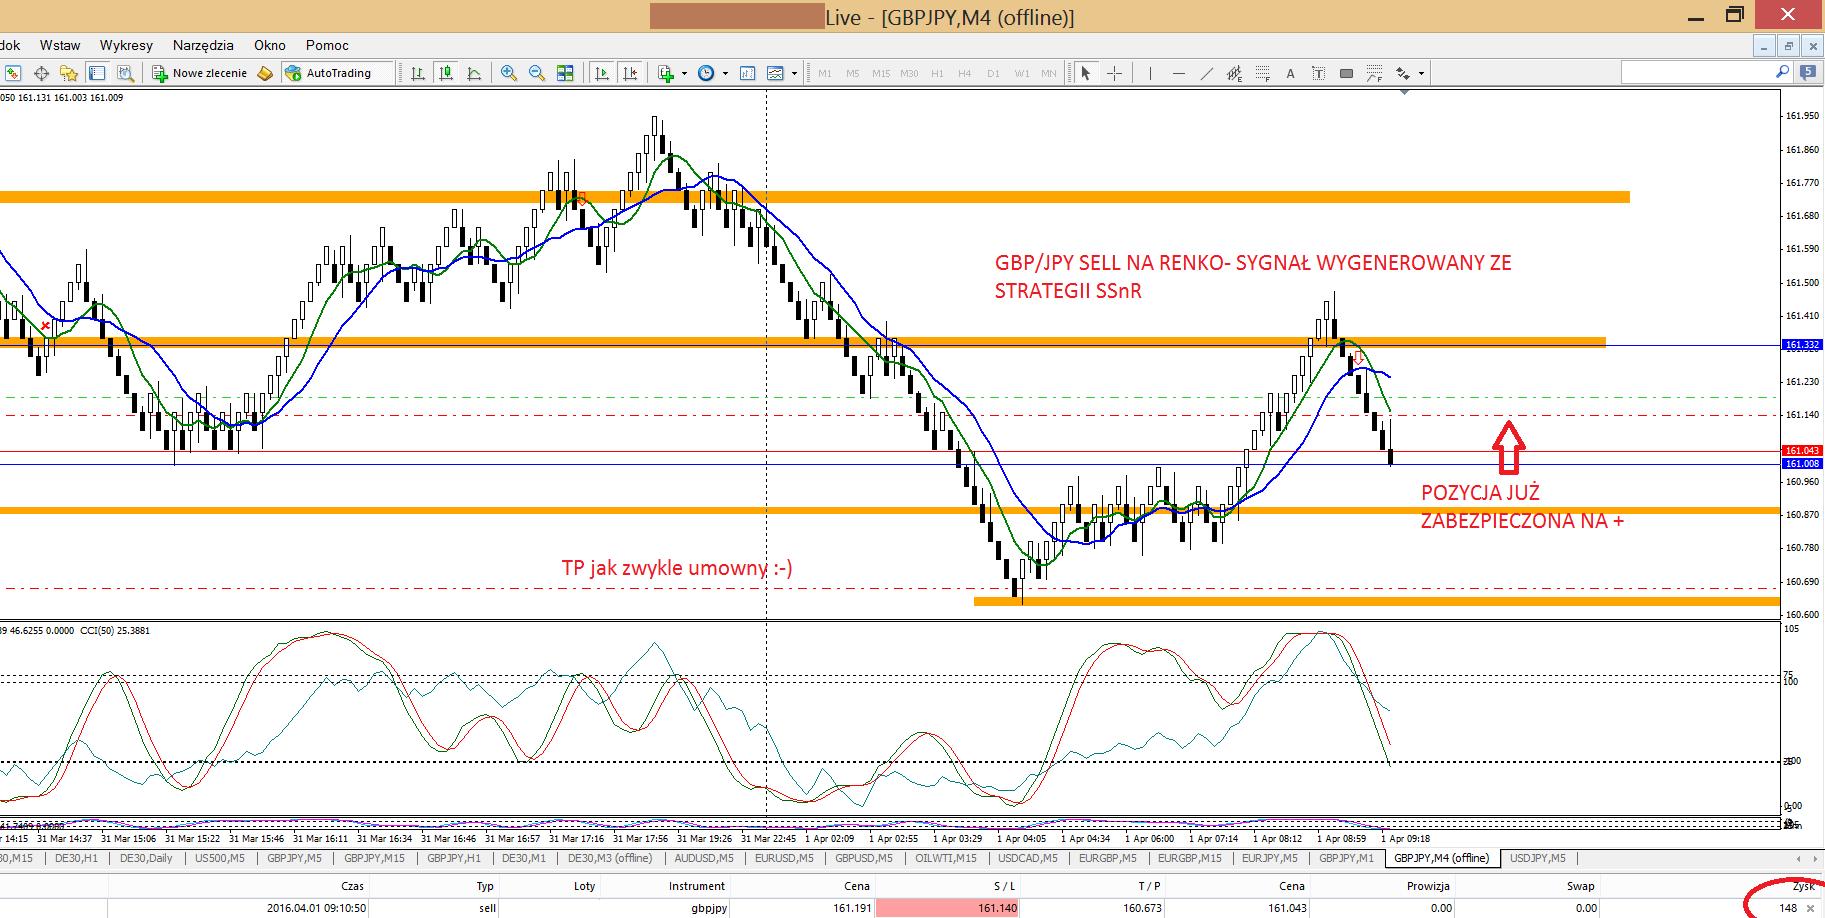 2-forex-scalping-skuteczna strategia na forex-renko-scalping na renko-trading-trader-dax-waluty